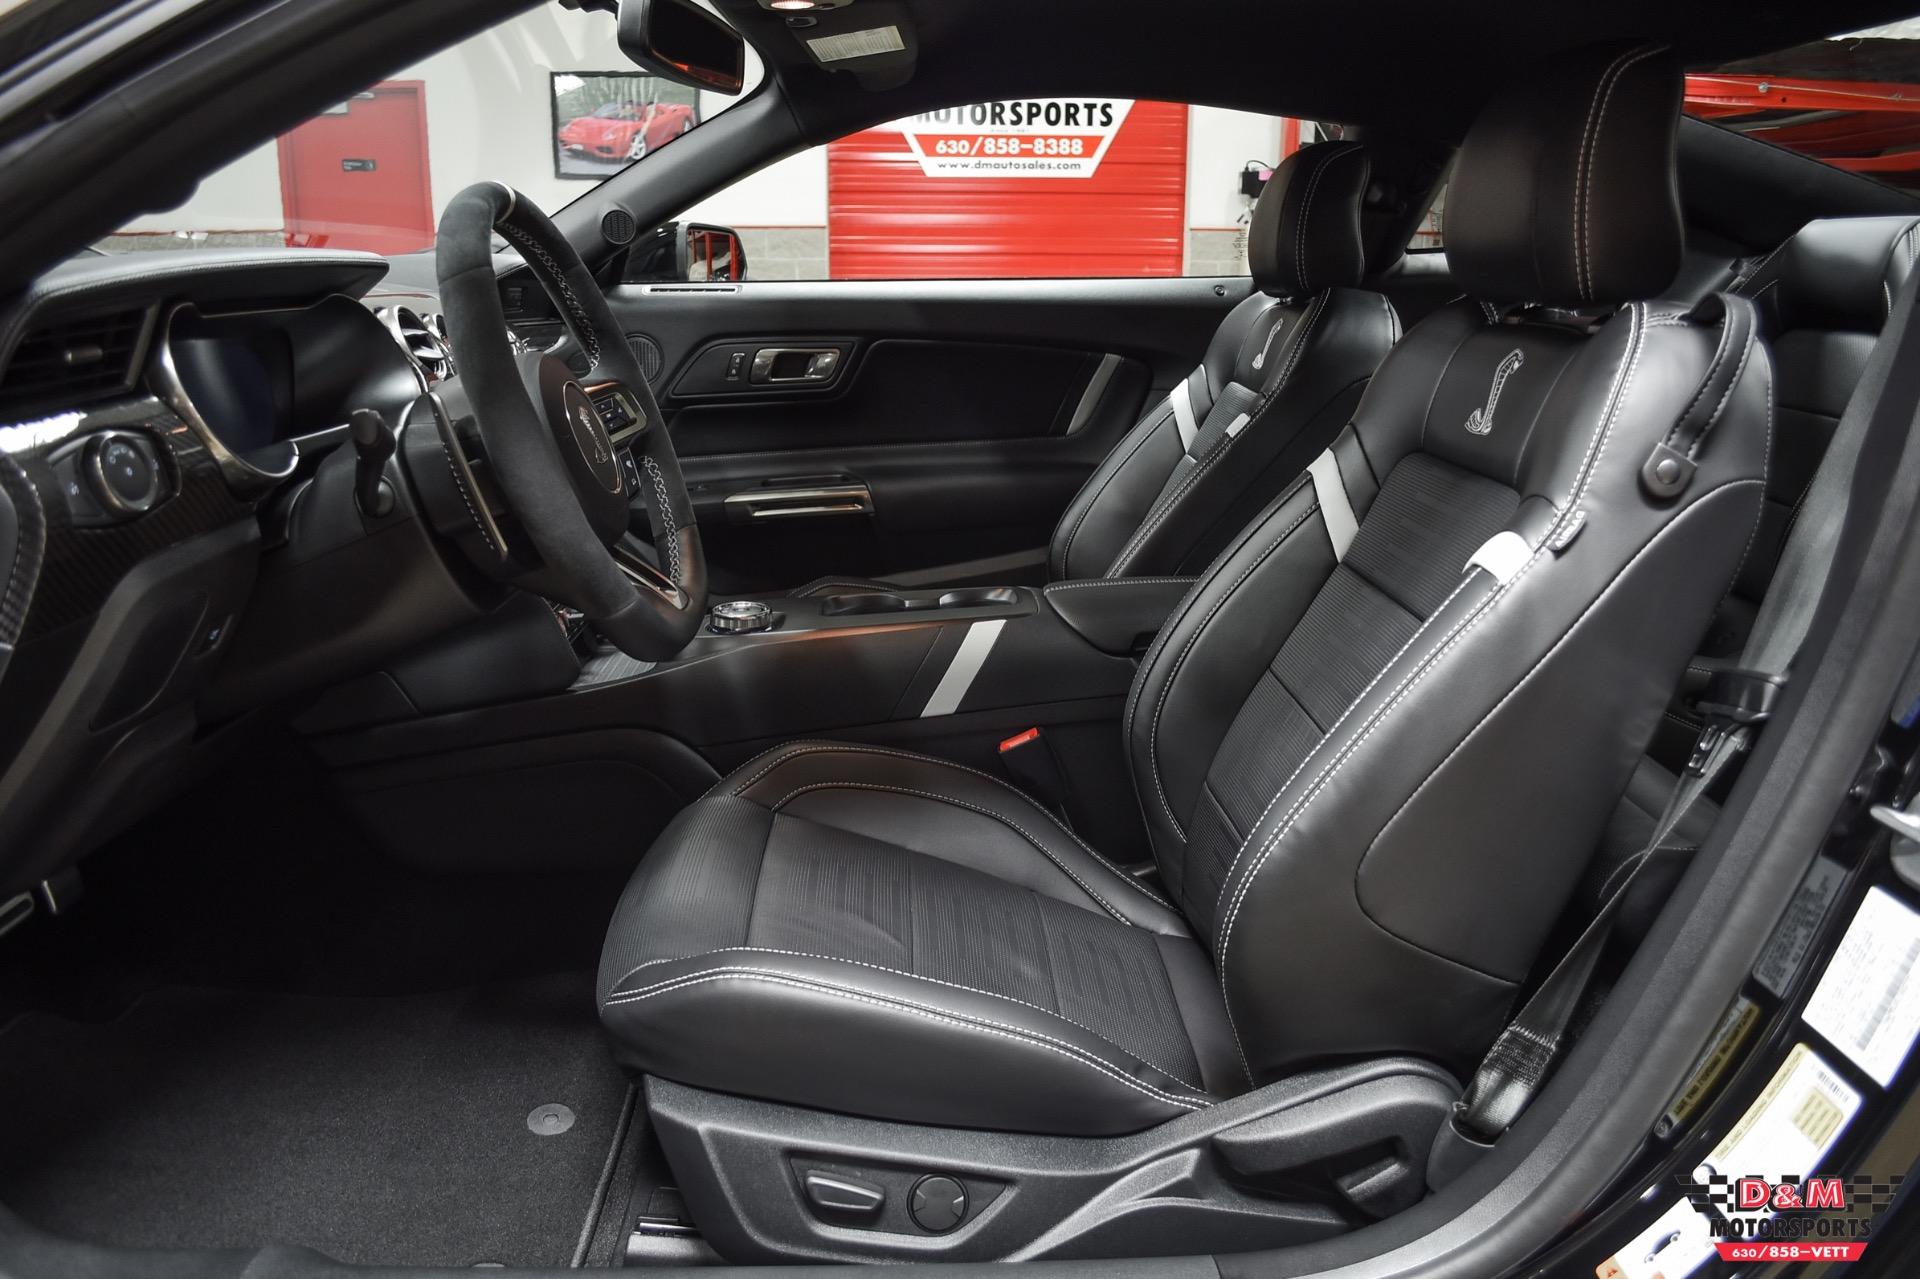 Used 2020 Ford Mustang Shelby GT500 | Glen Ellyn, IL